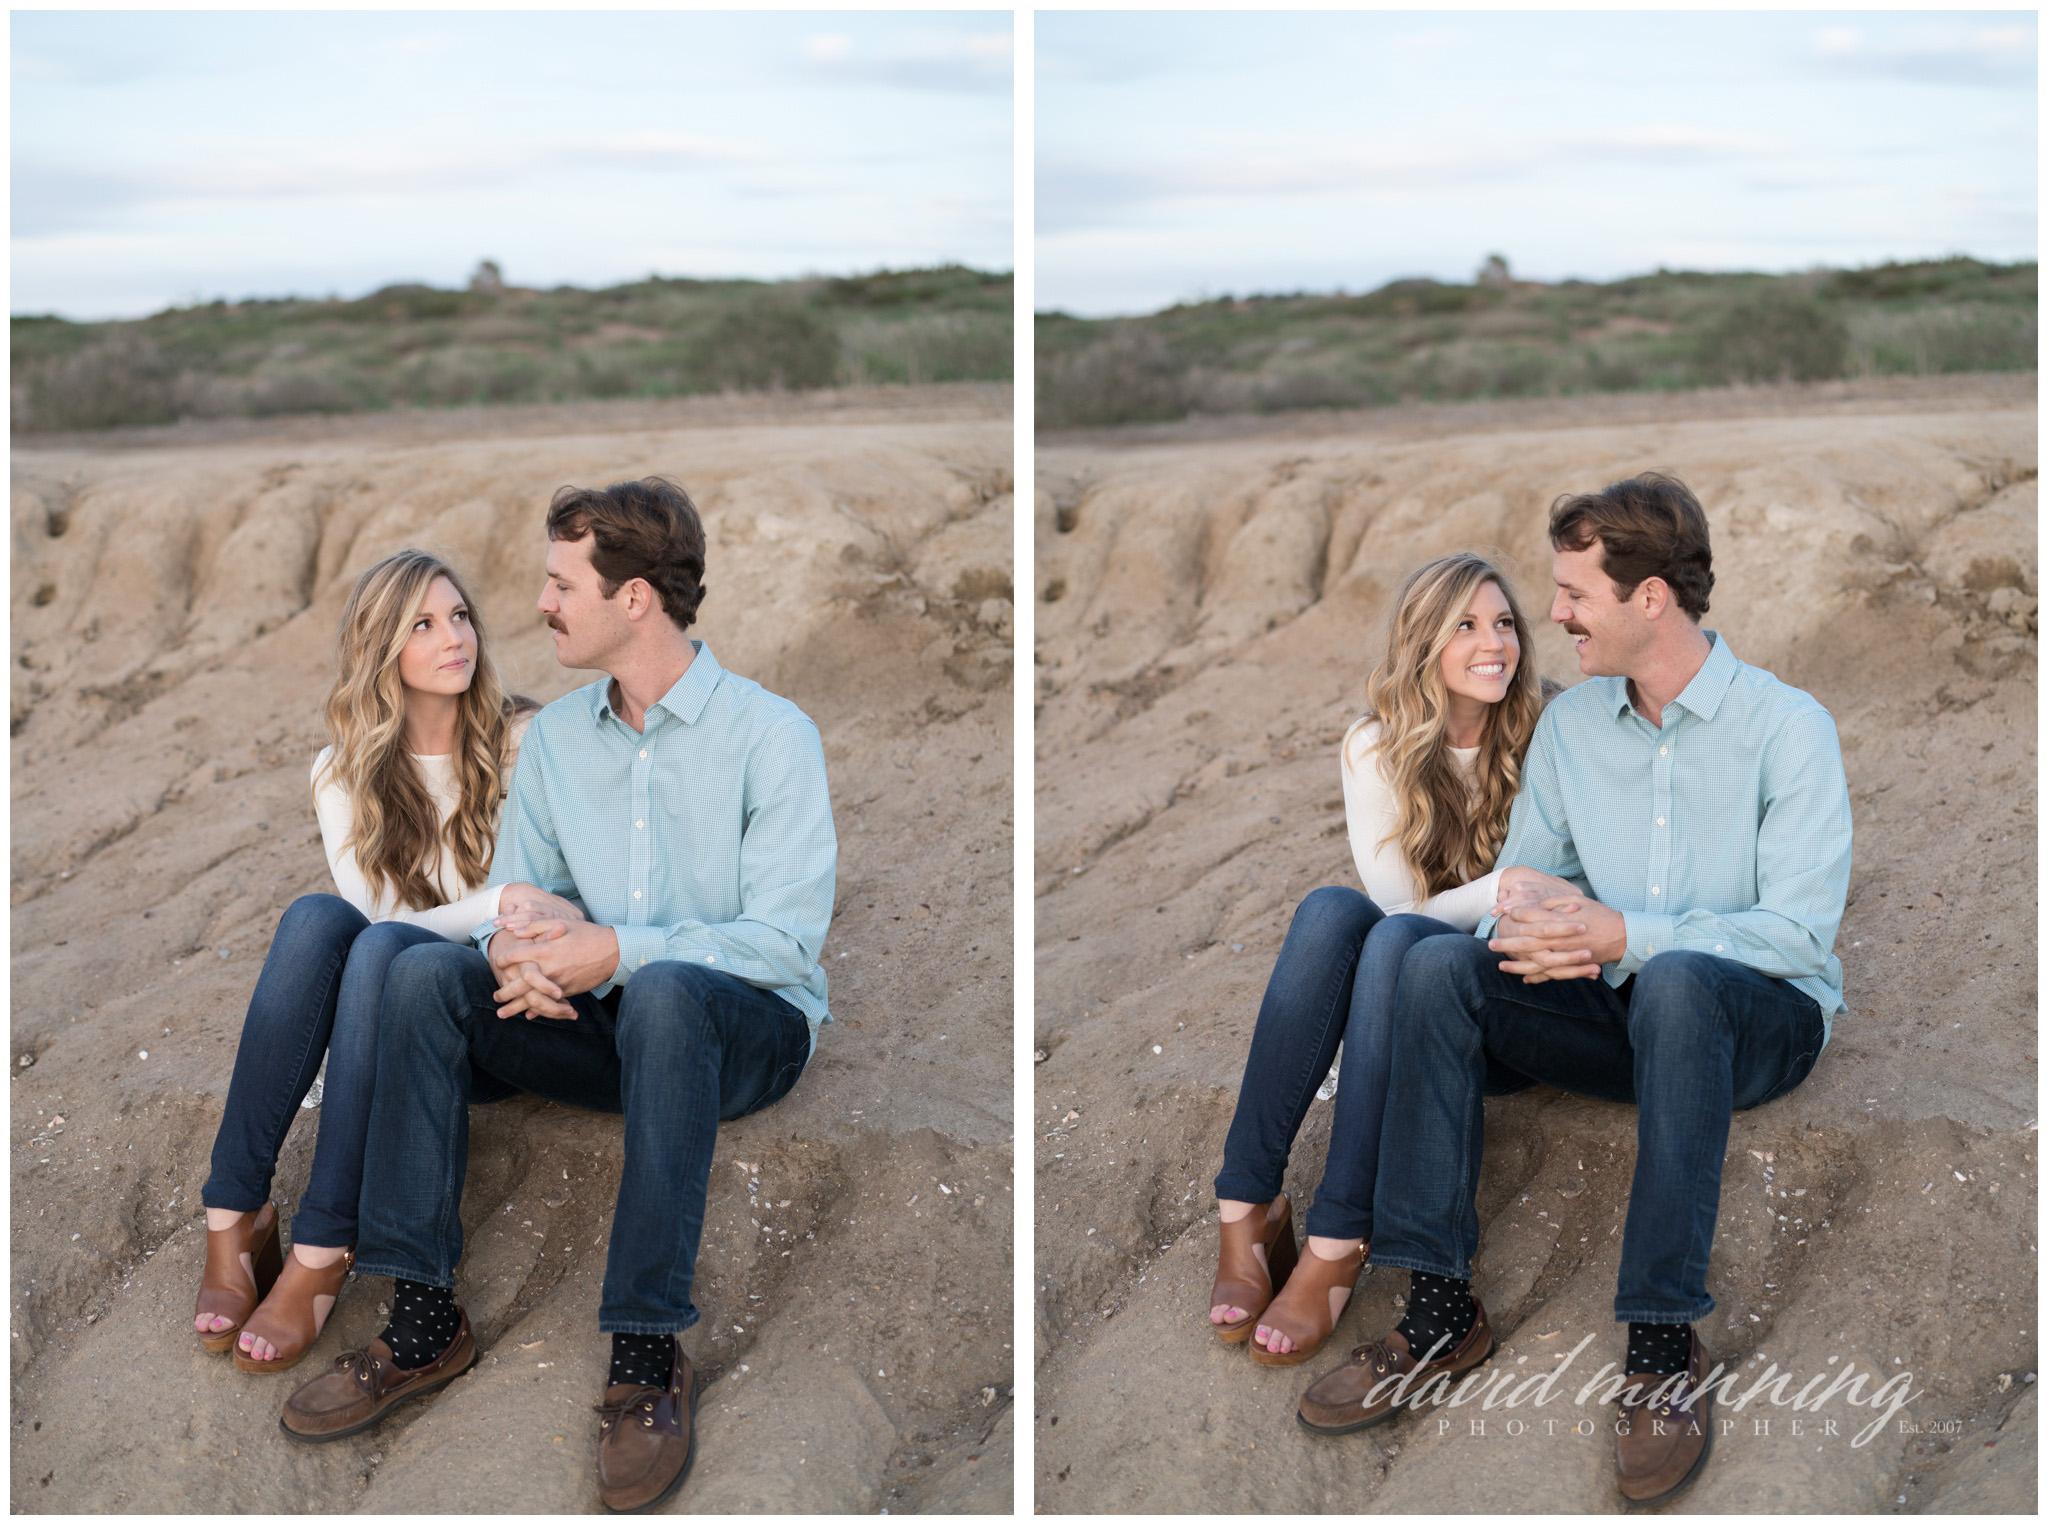 Alyssa-Taylor-Engagement-David-Manning-Photographer-0150.JPG